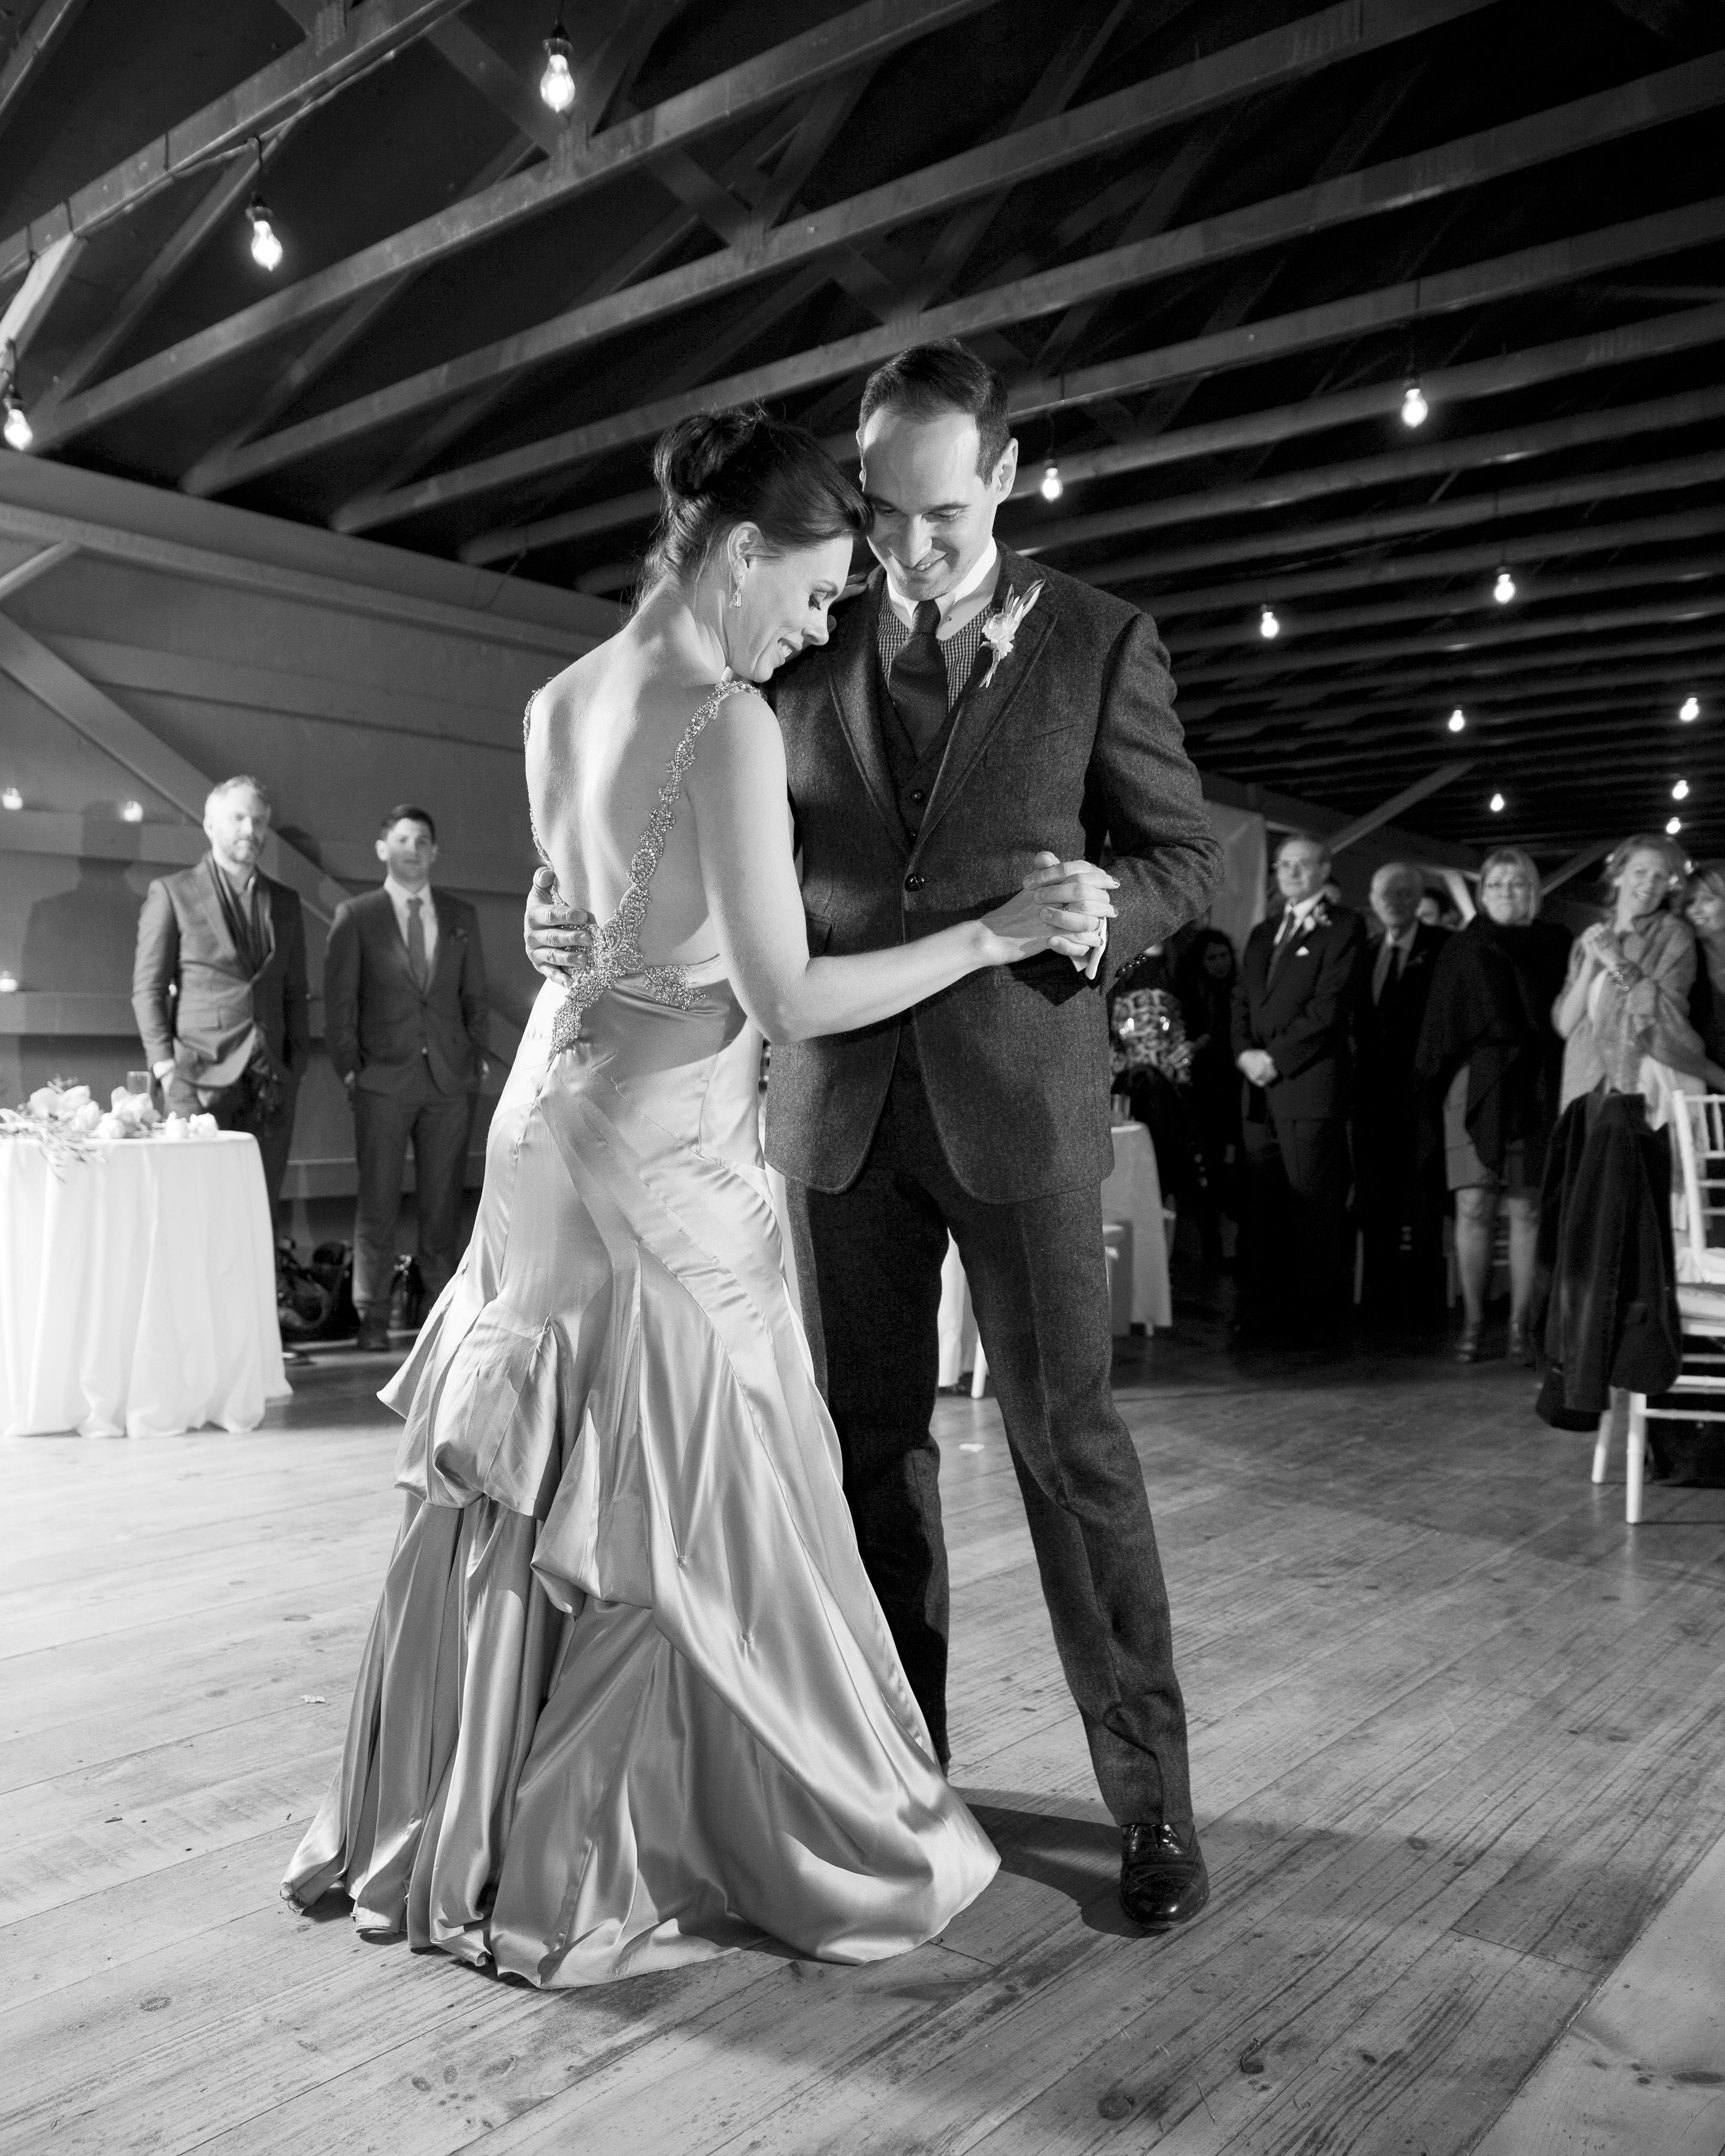 hanna-jimm-wedding-firstdance-266-s111413-0814.jpg